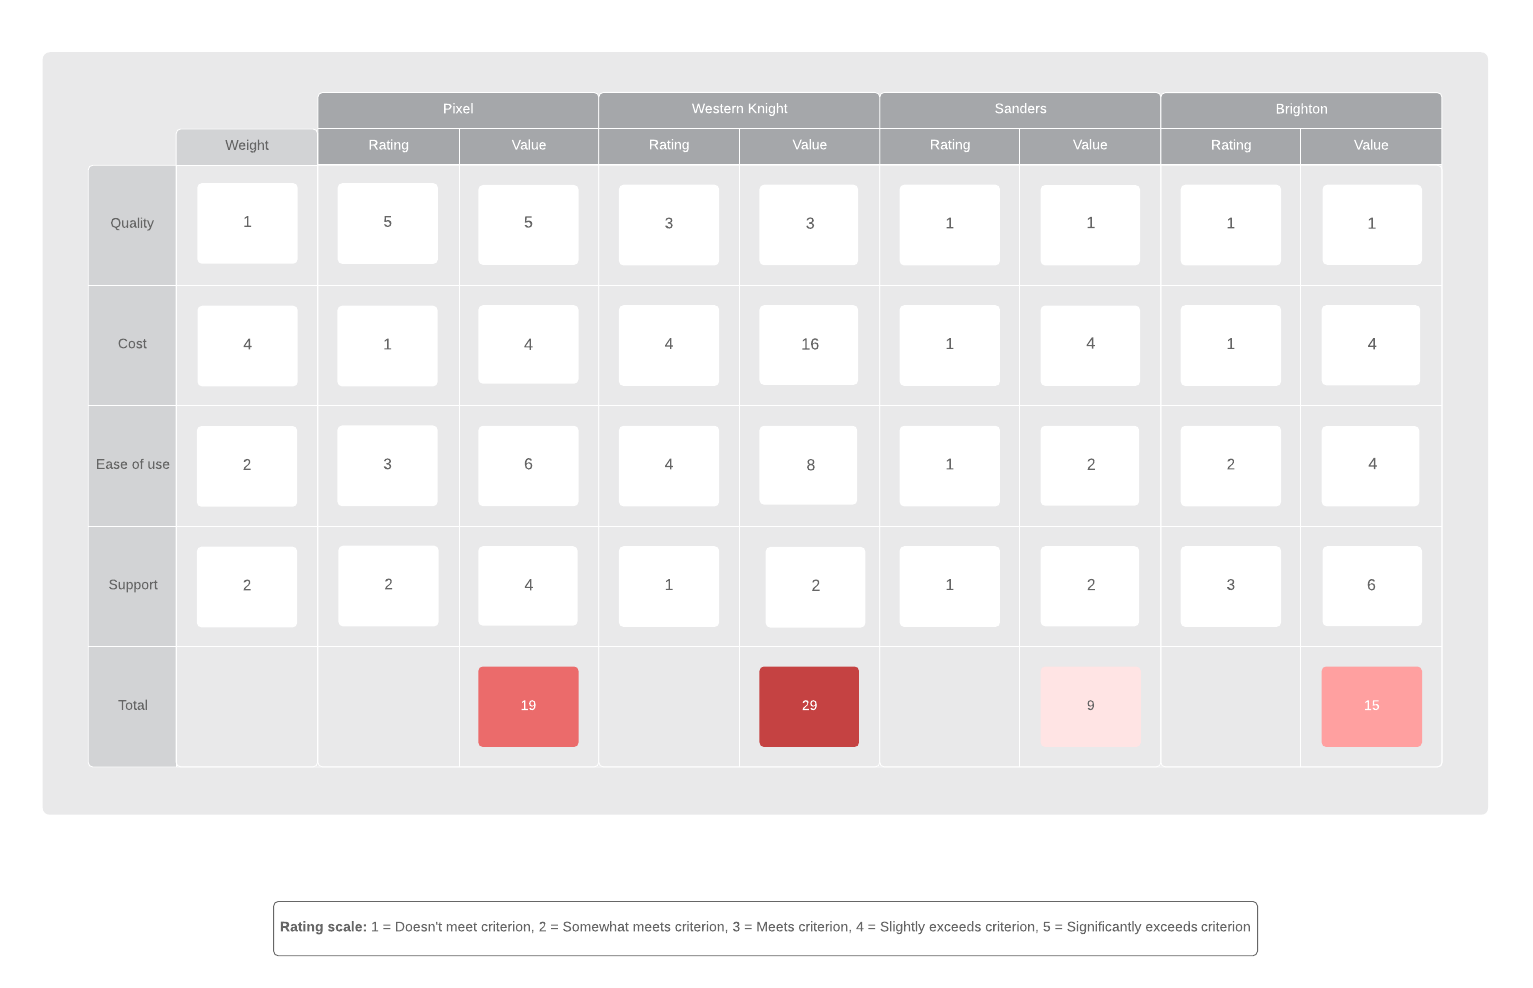 How to Use a Decision Matrix to Make Tough Choices